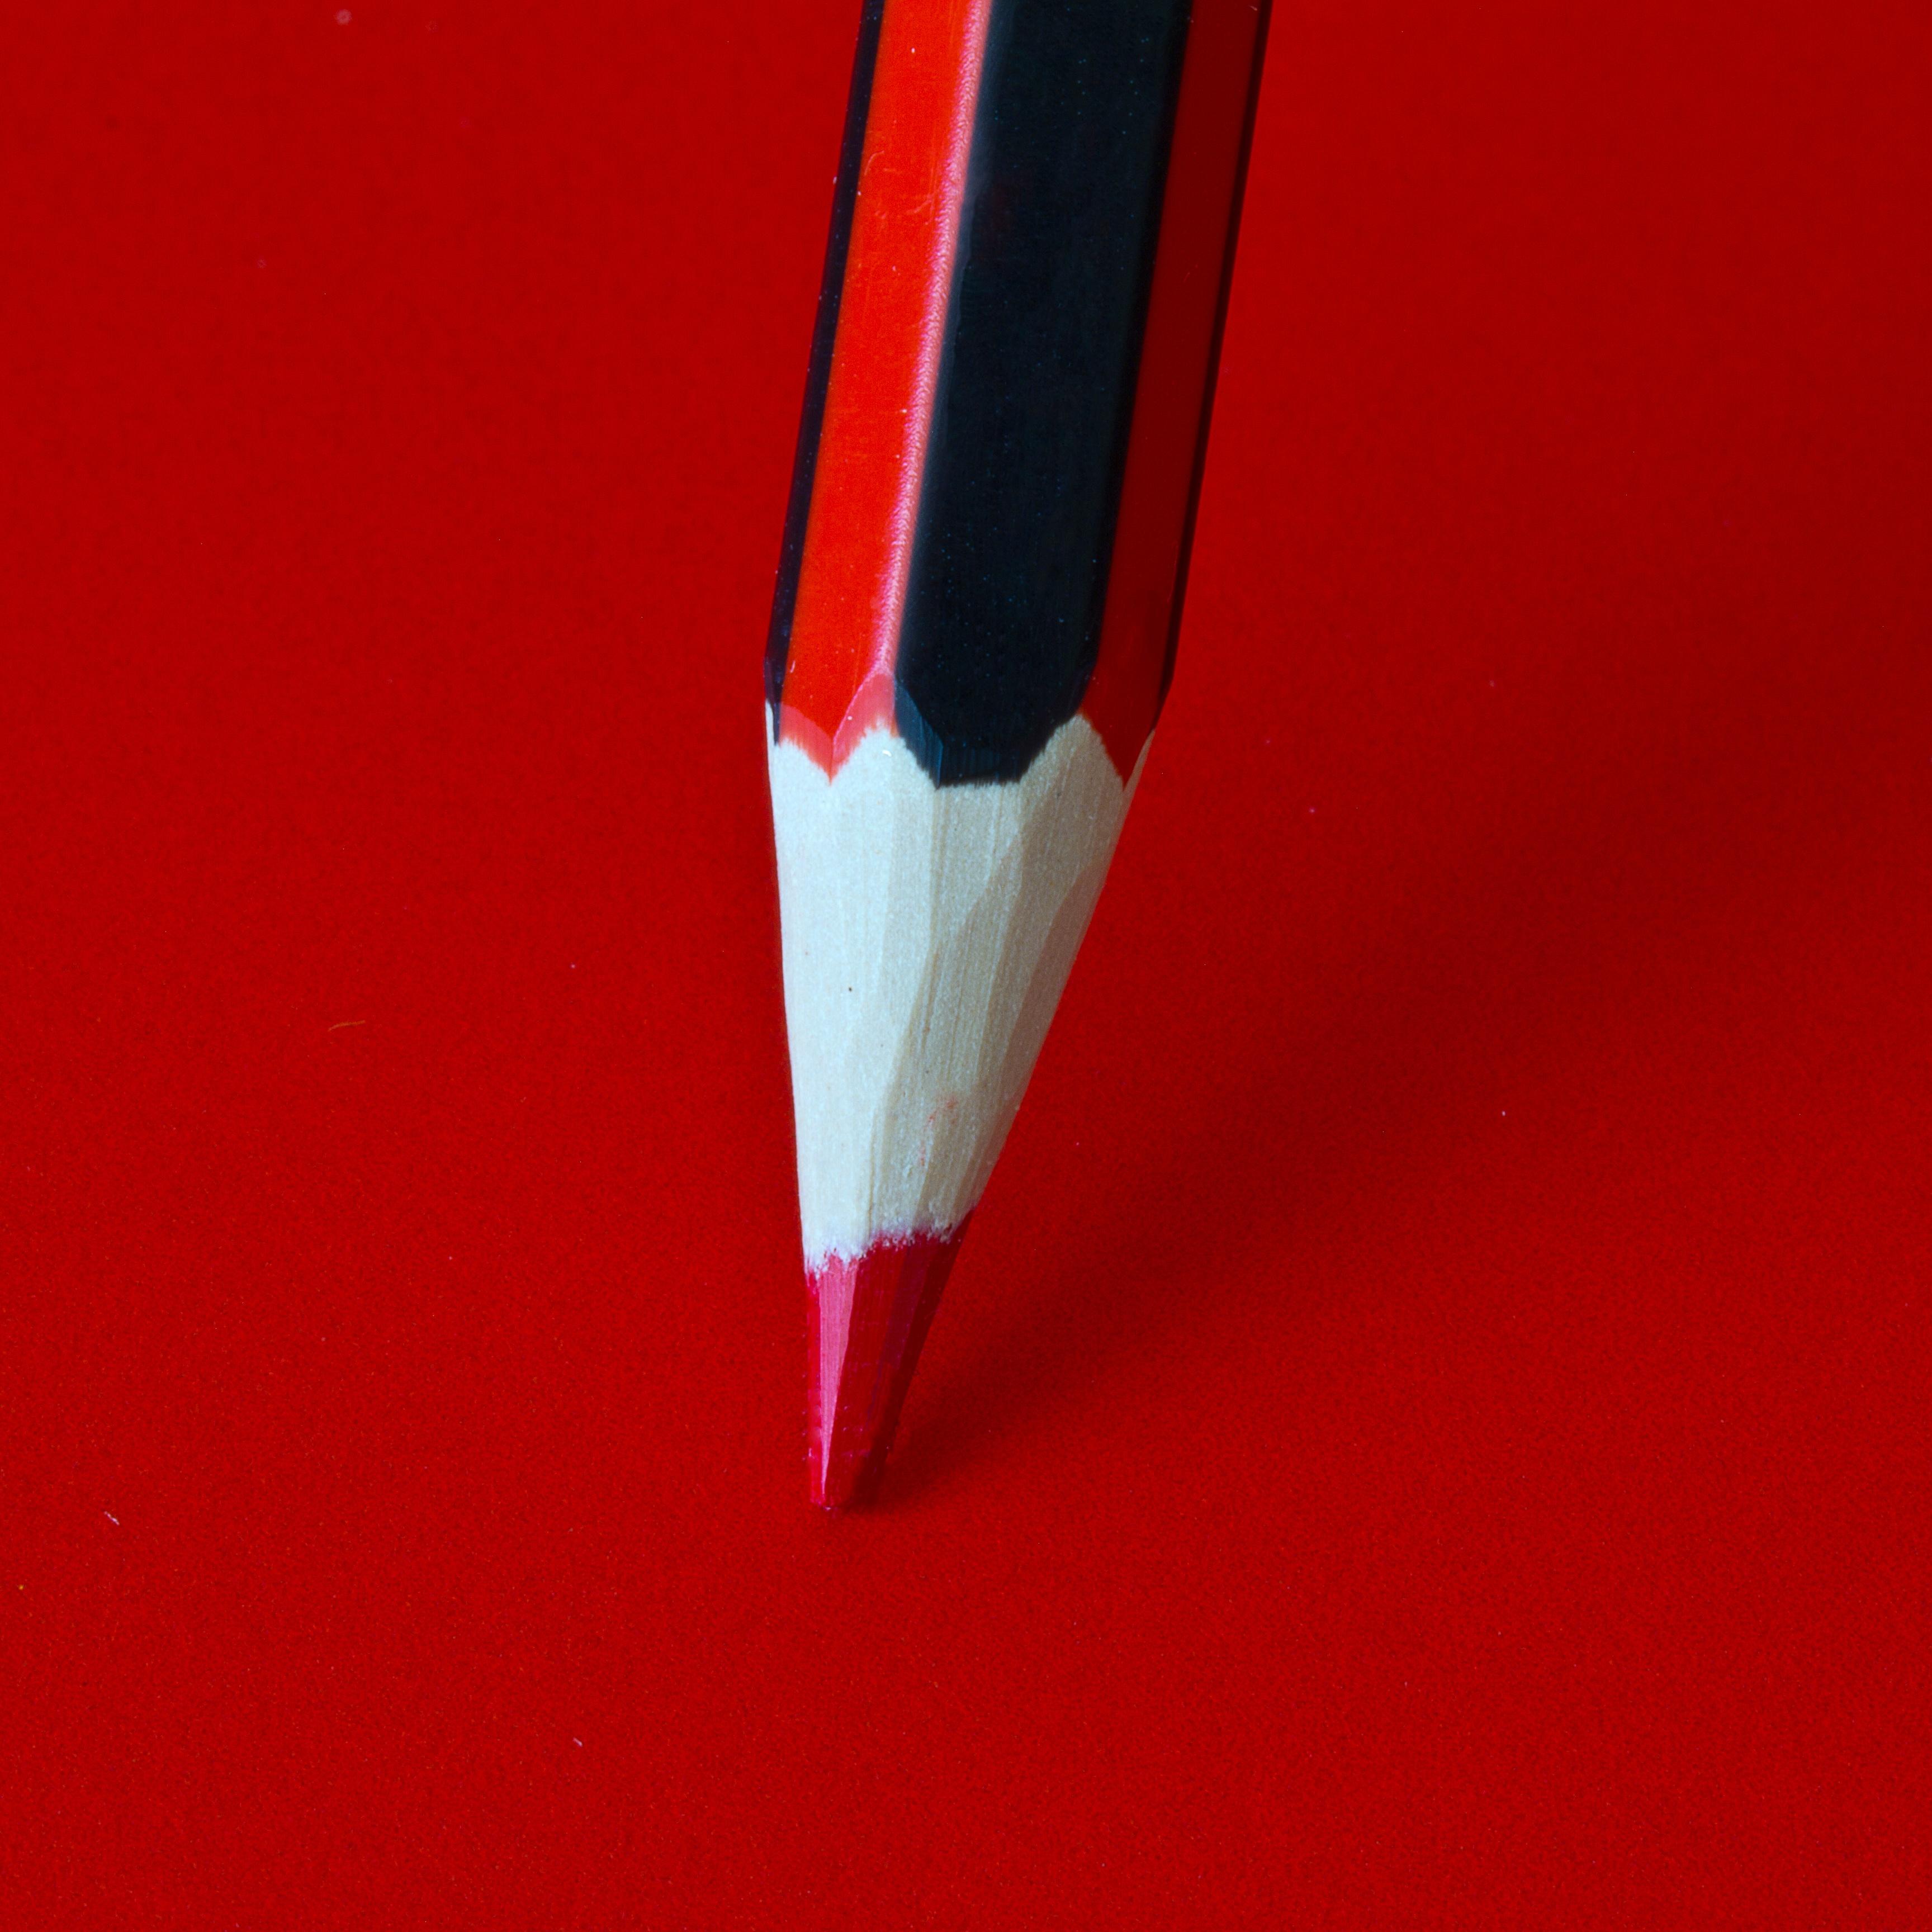 red-pencil.jpeg